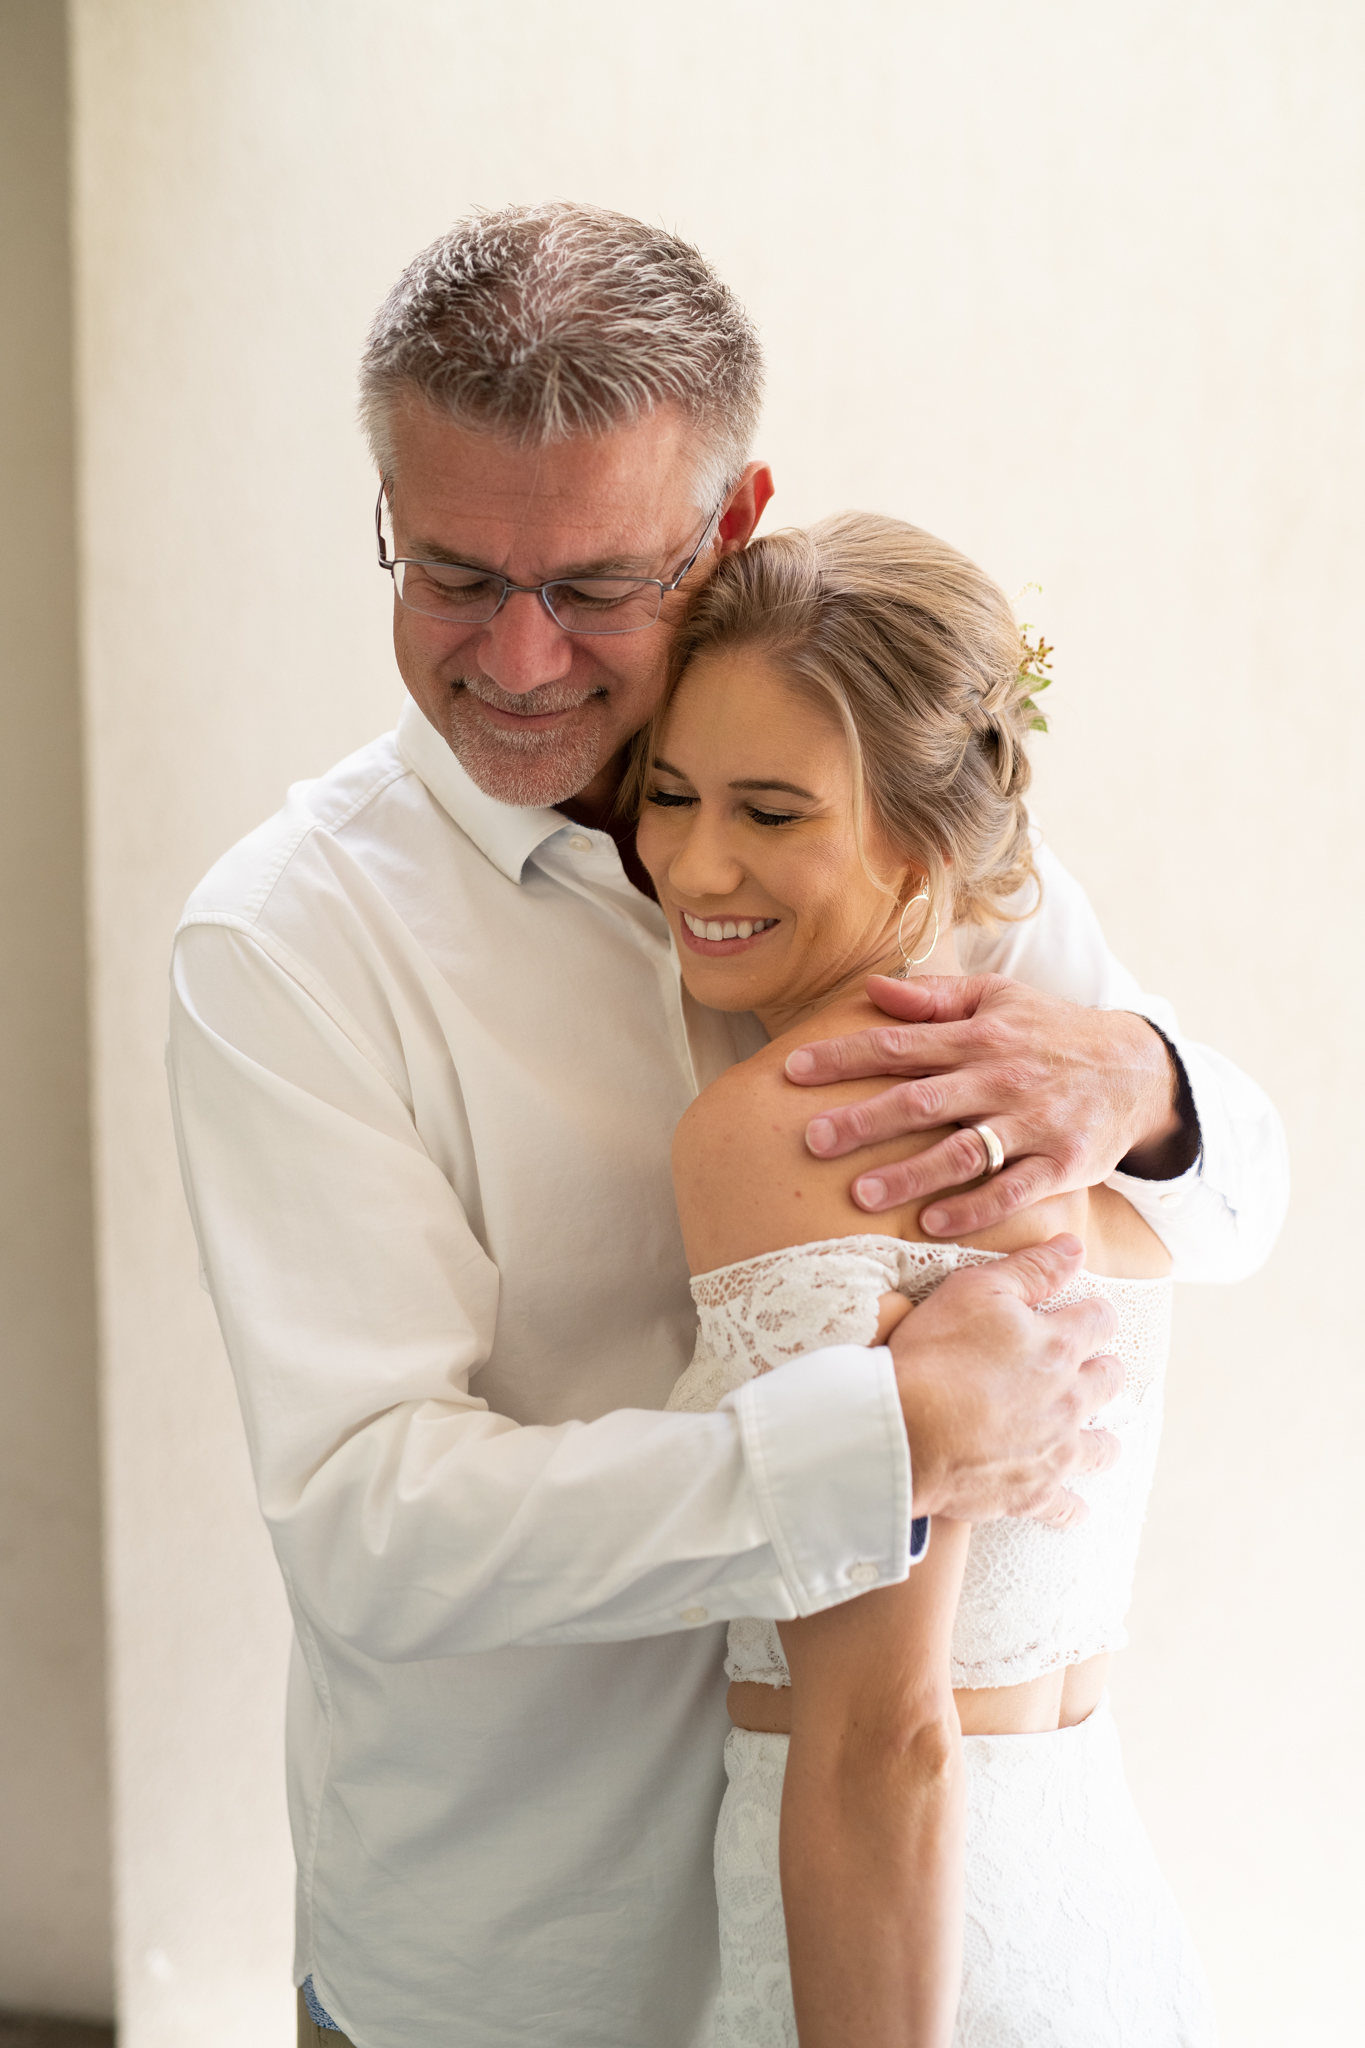 04_PRVW_Jenny_Ken_Wedding_Trevor_Hooper_Photo.jpg